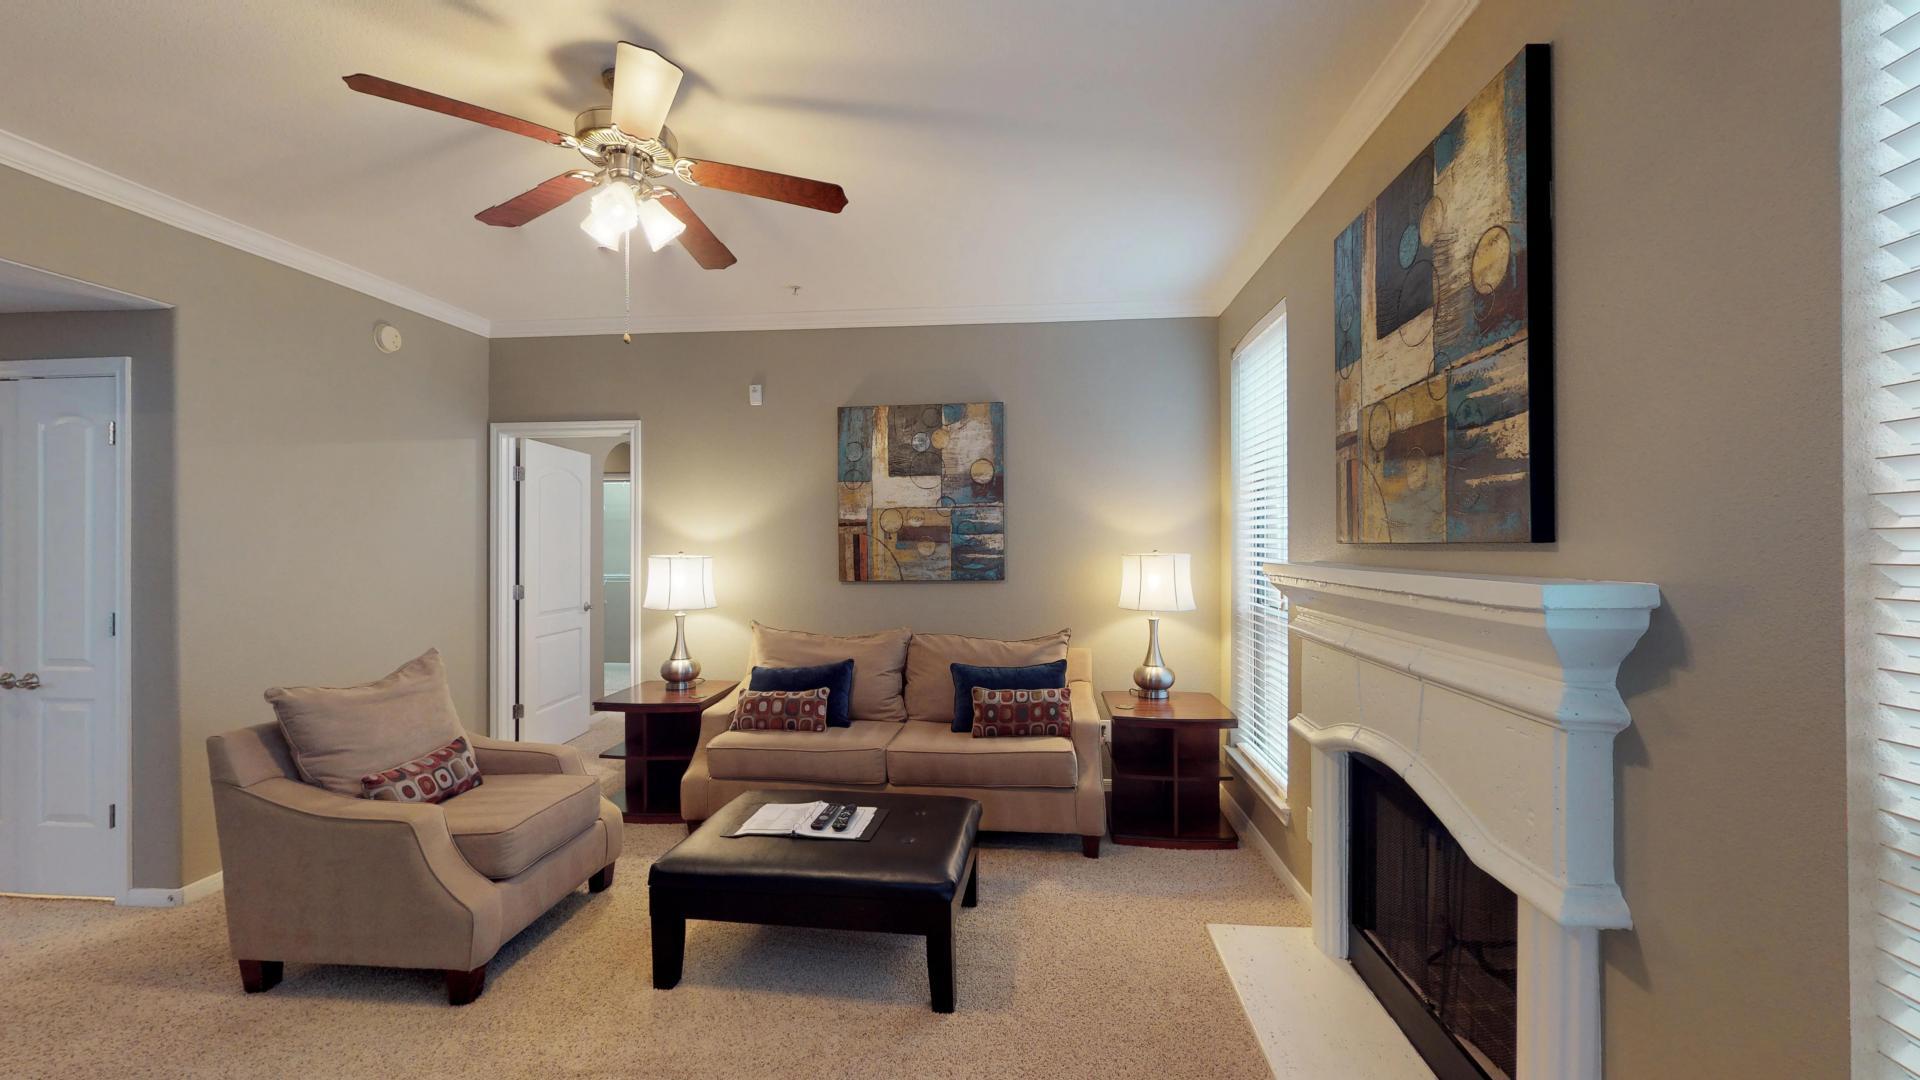 Living room at San Paloma Corporate Housing